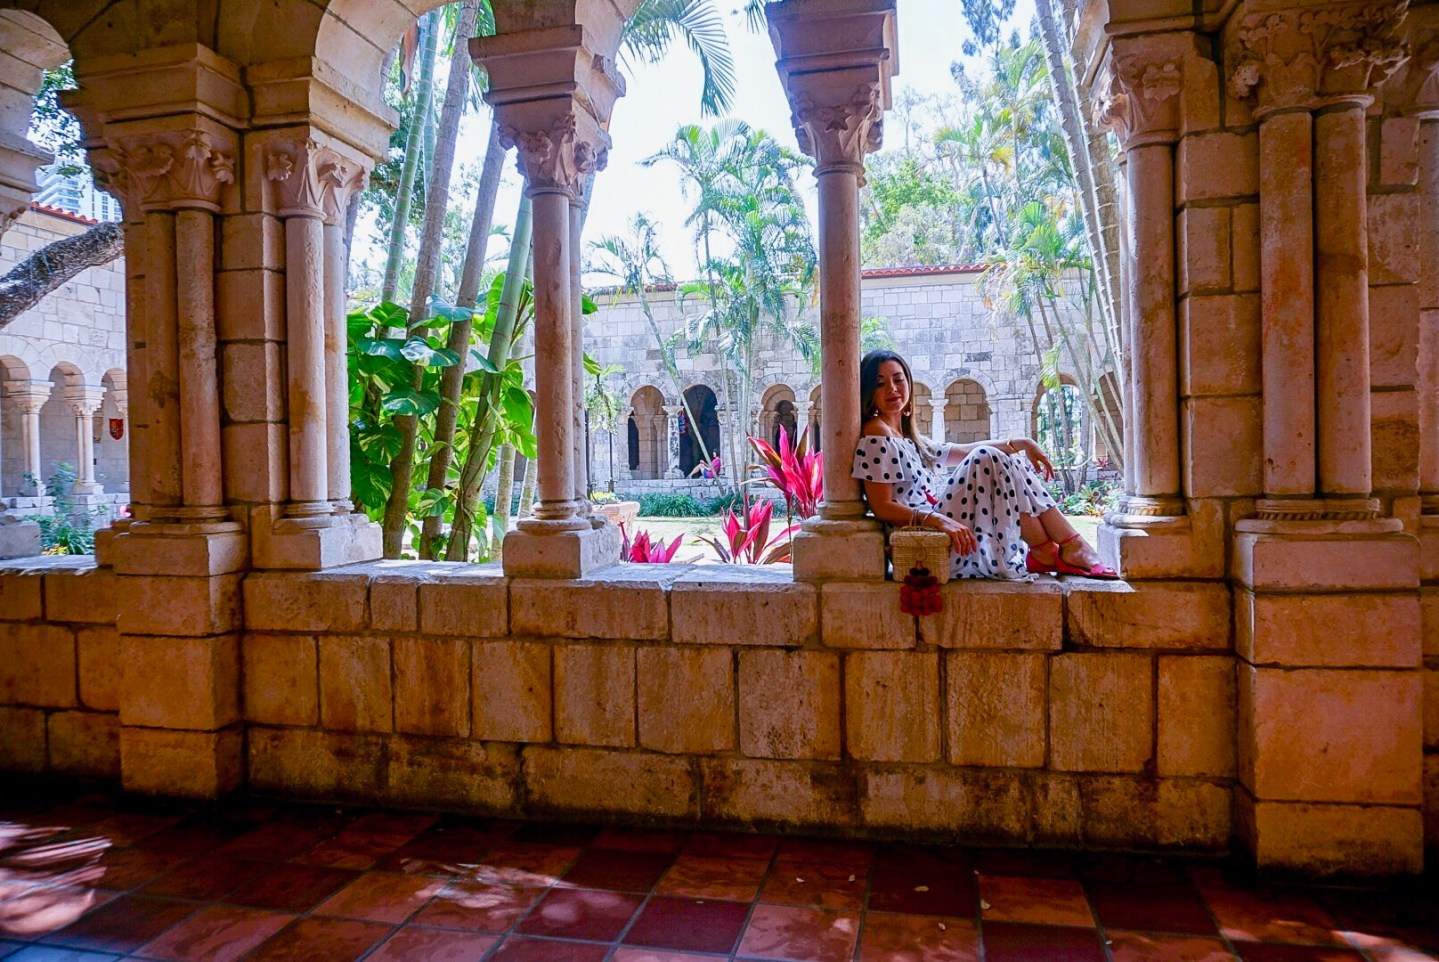 Miami Hidden Gem: Spanish Monastery Pt. 2